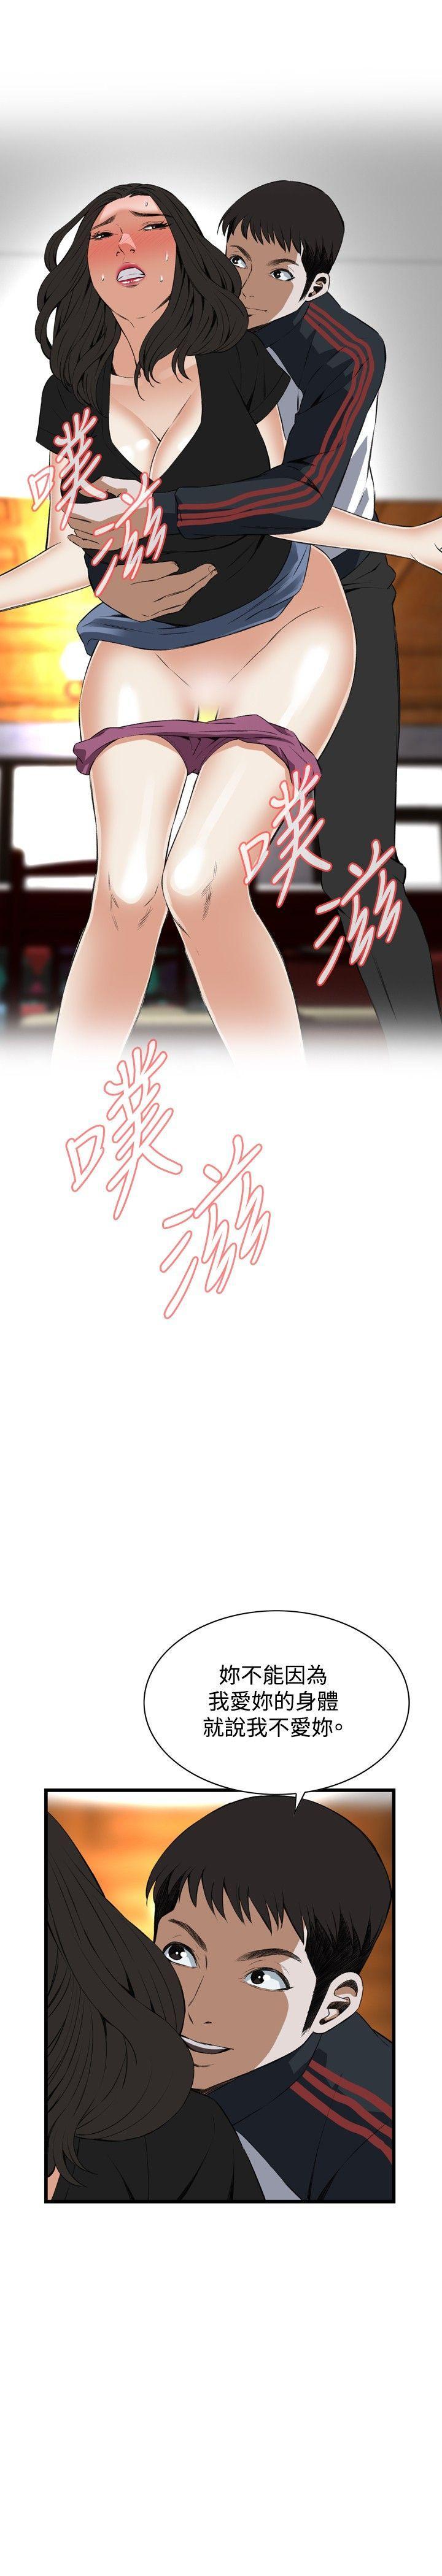 Take a Peek 偷窥 Ch.39~60 [Chinese]中文 584